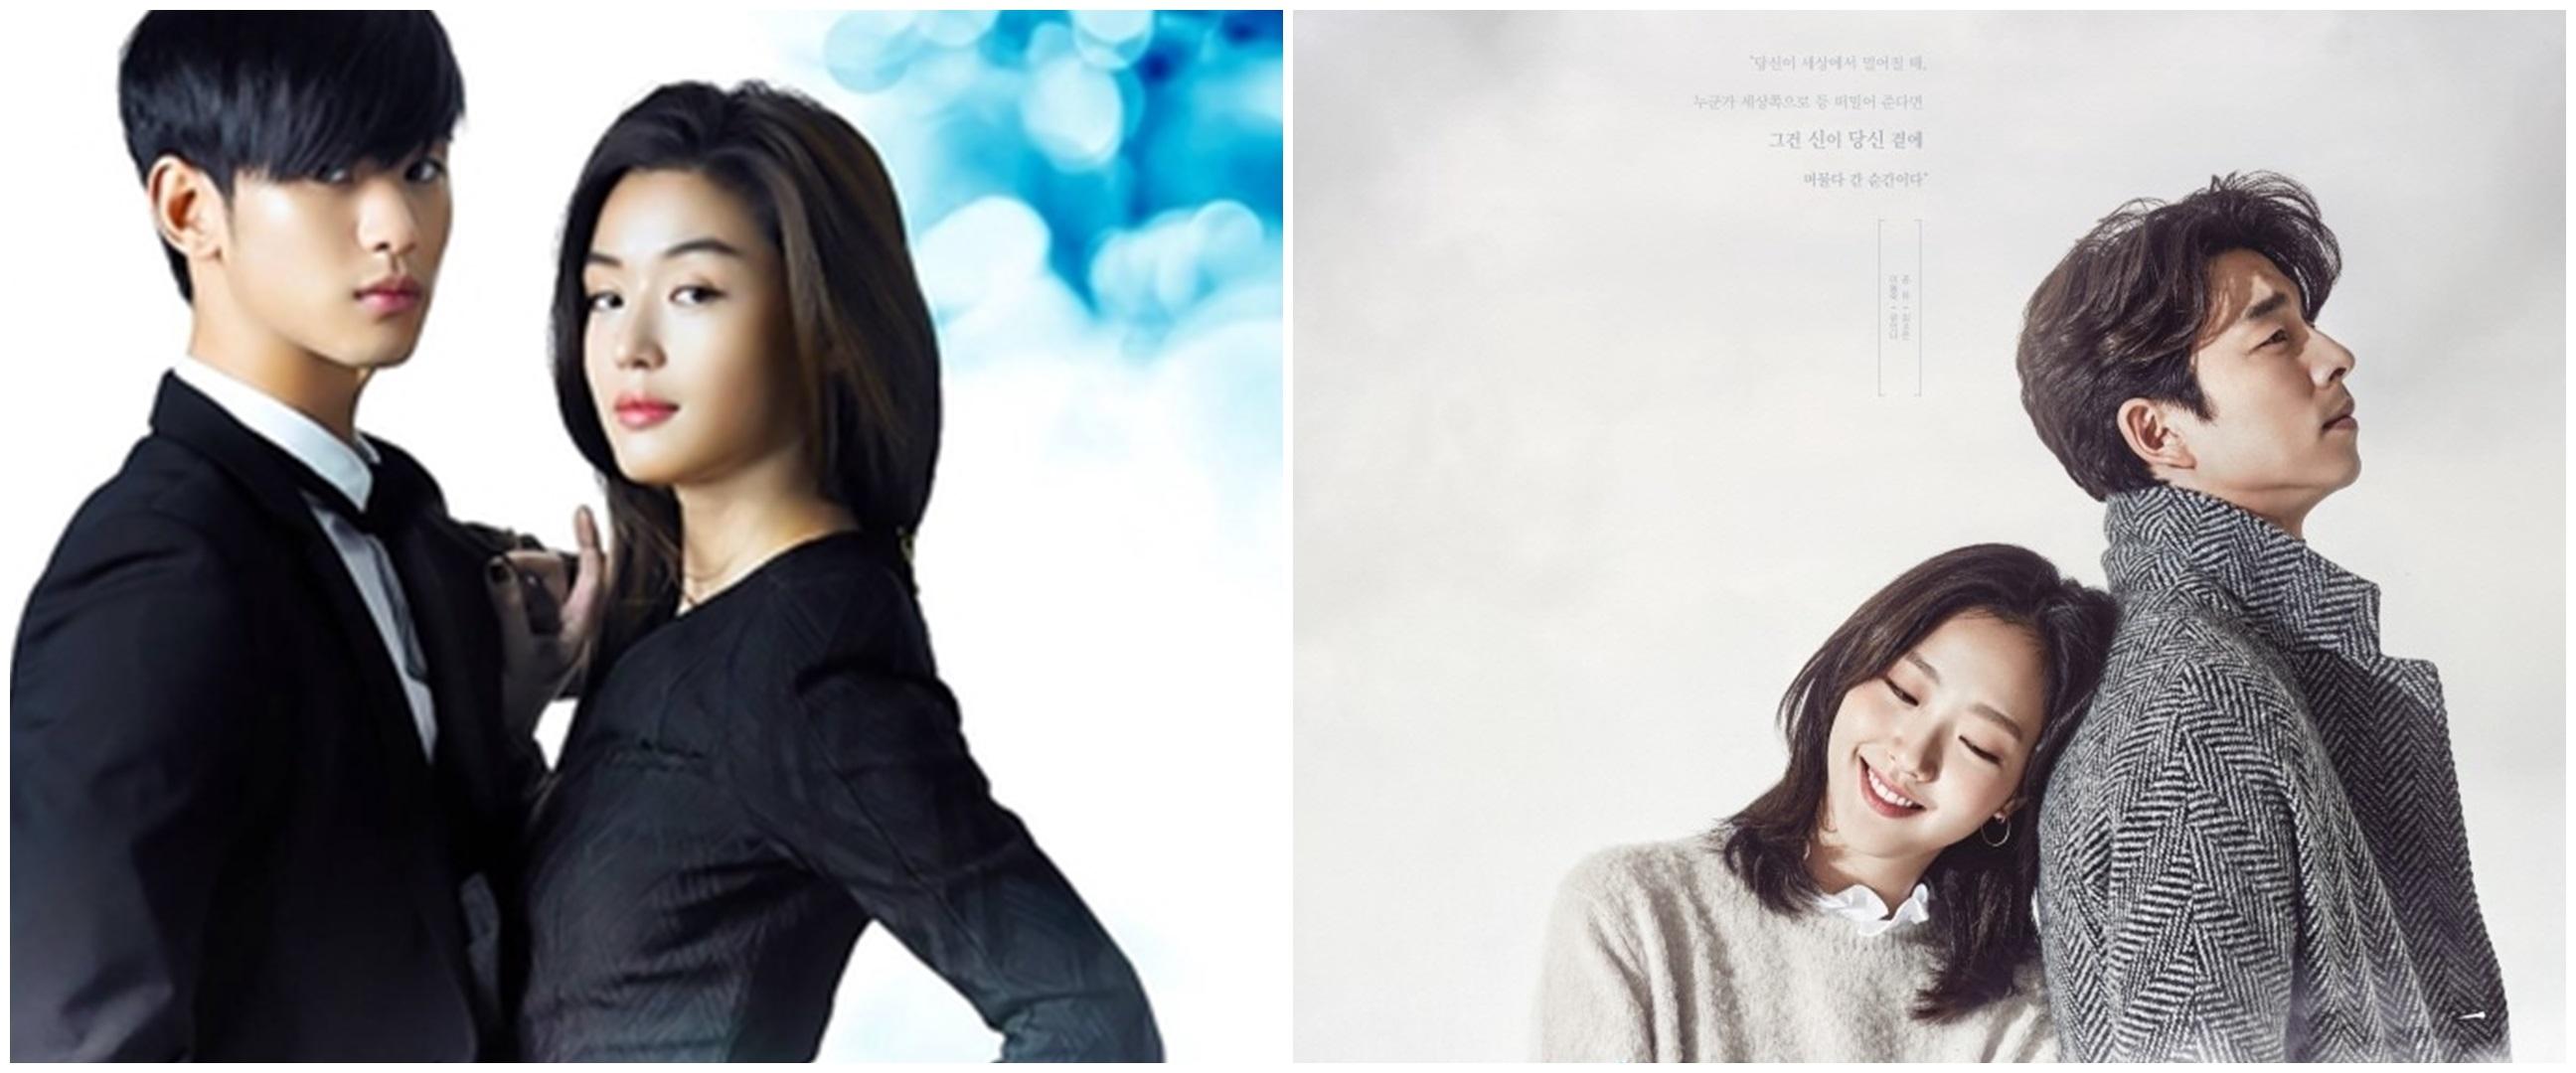 15 Drama Korea fantasi terpopuler sepanjang masa, menarik ditonton